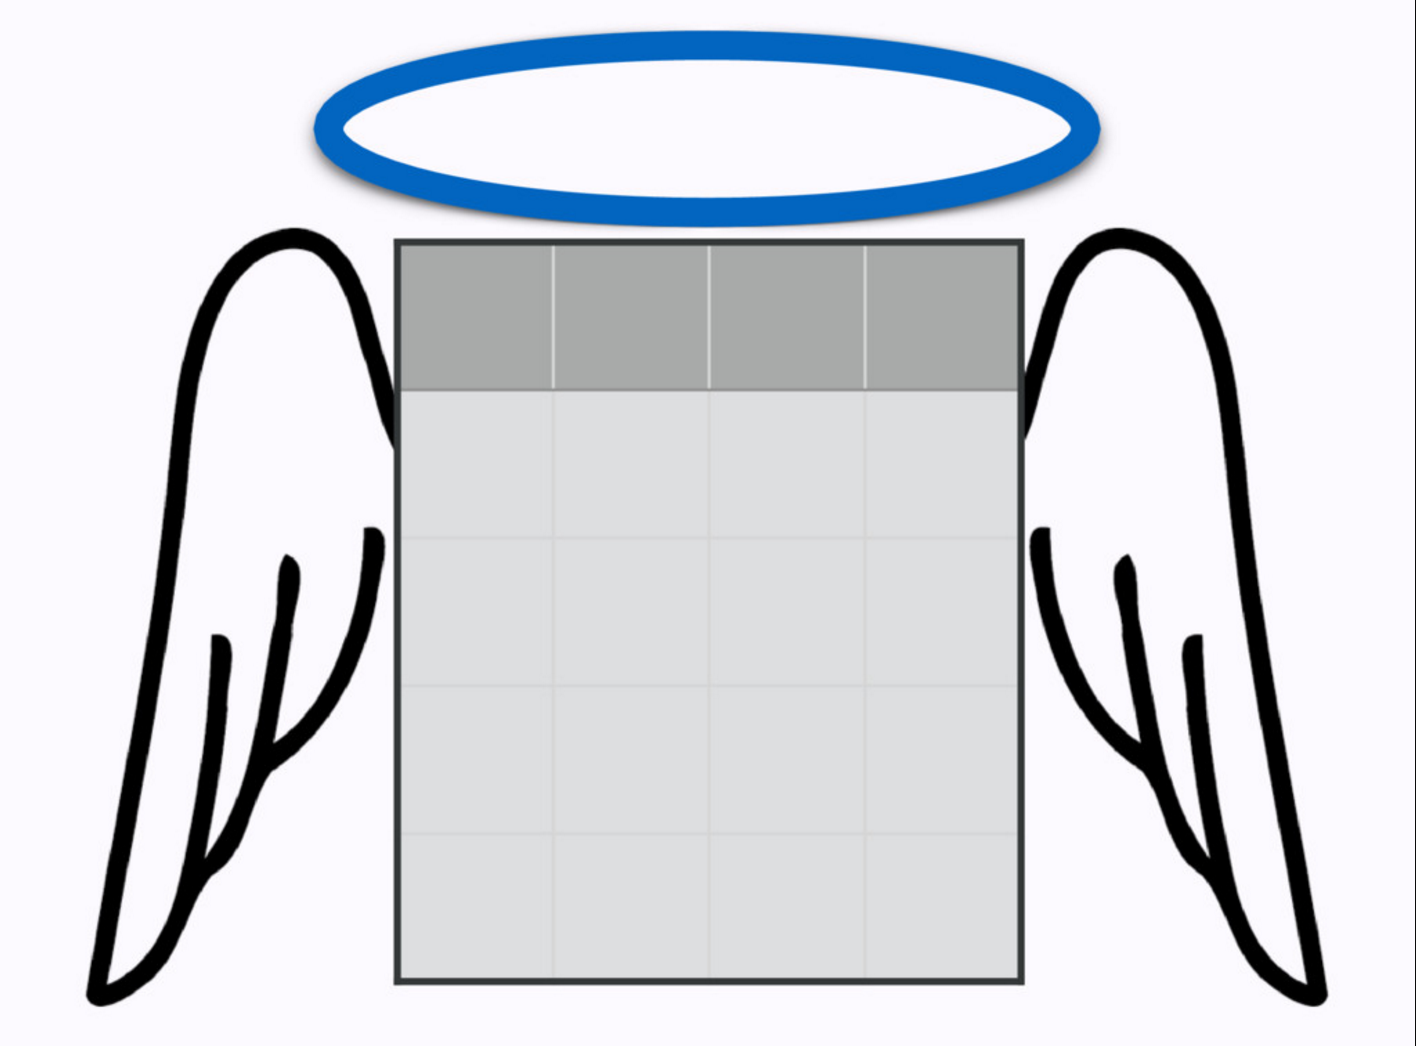 Data rectangle